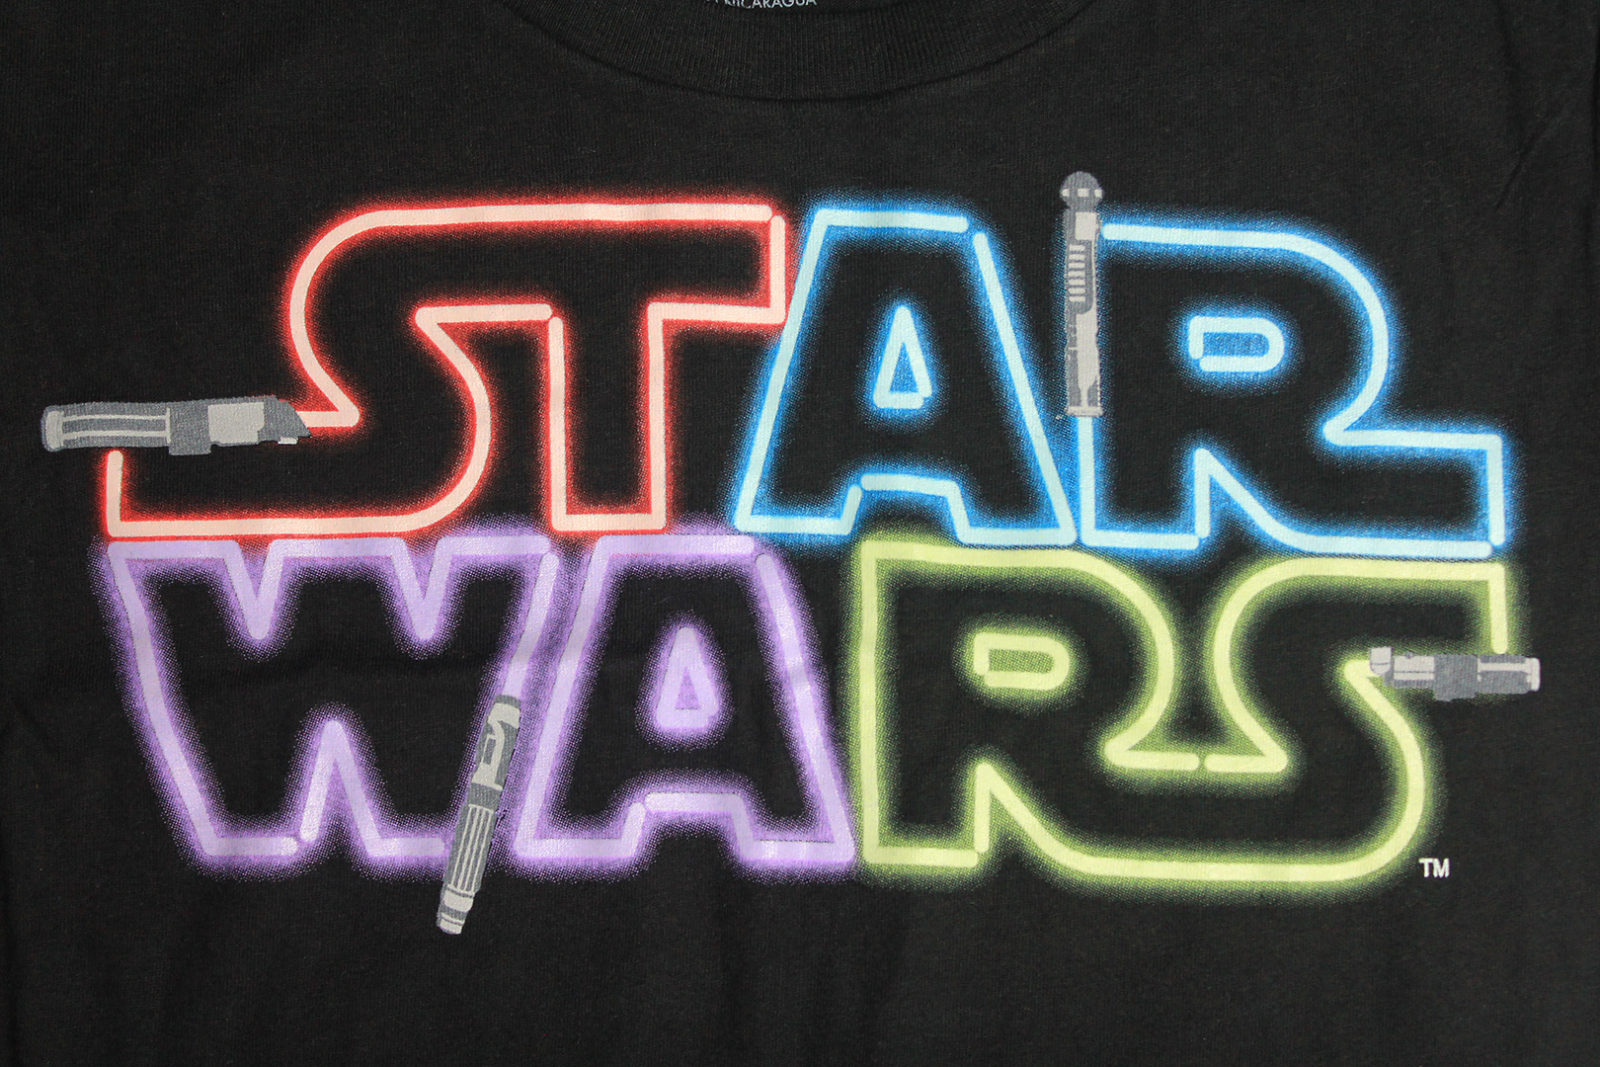 Her Universe - Lightsaber logo tee (print detail in light)